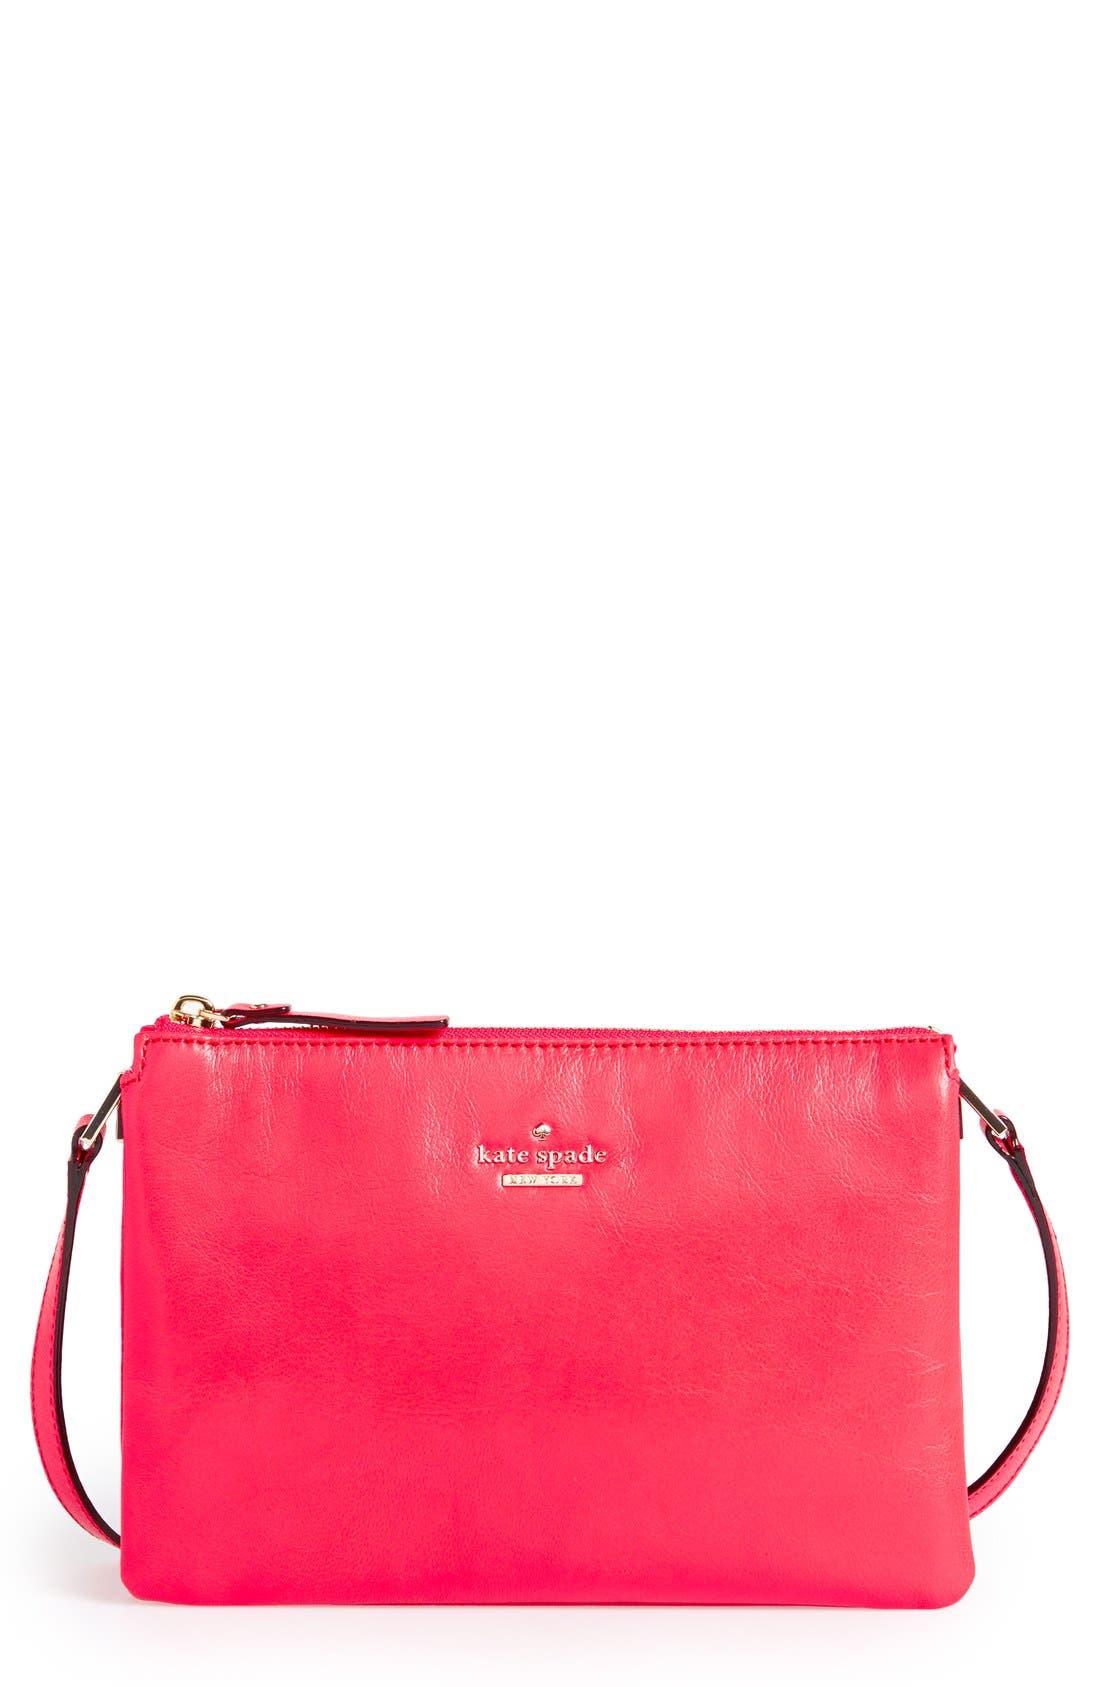 Main Image - kate spade new york 'ivy place - gabriella' leather crossbody bag